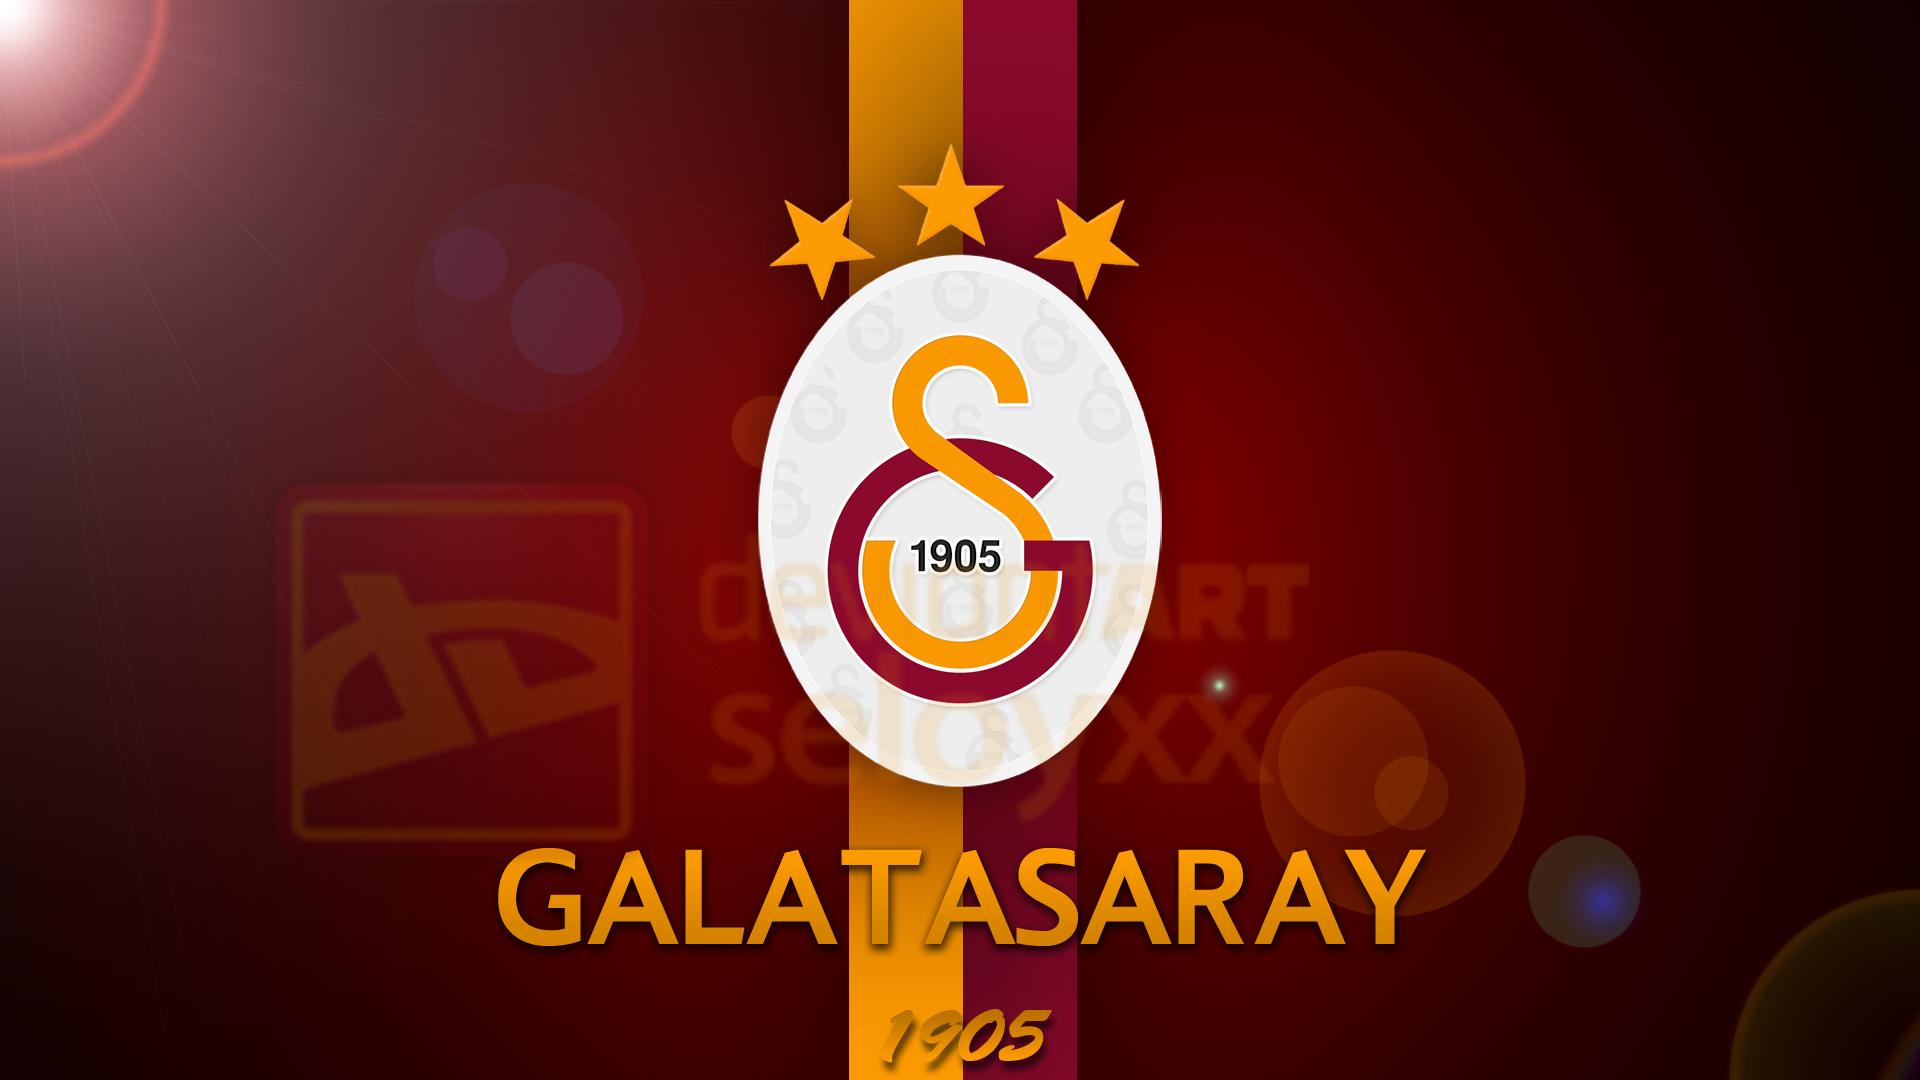 Galatasaray Wallpaper by seloyxx on DeviantArt